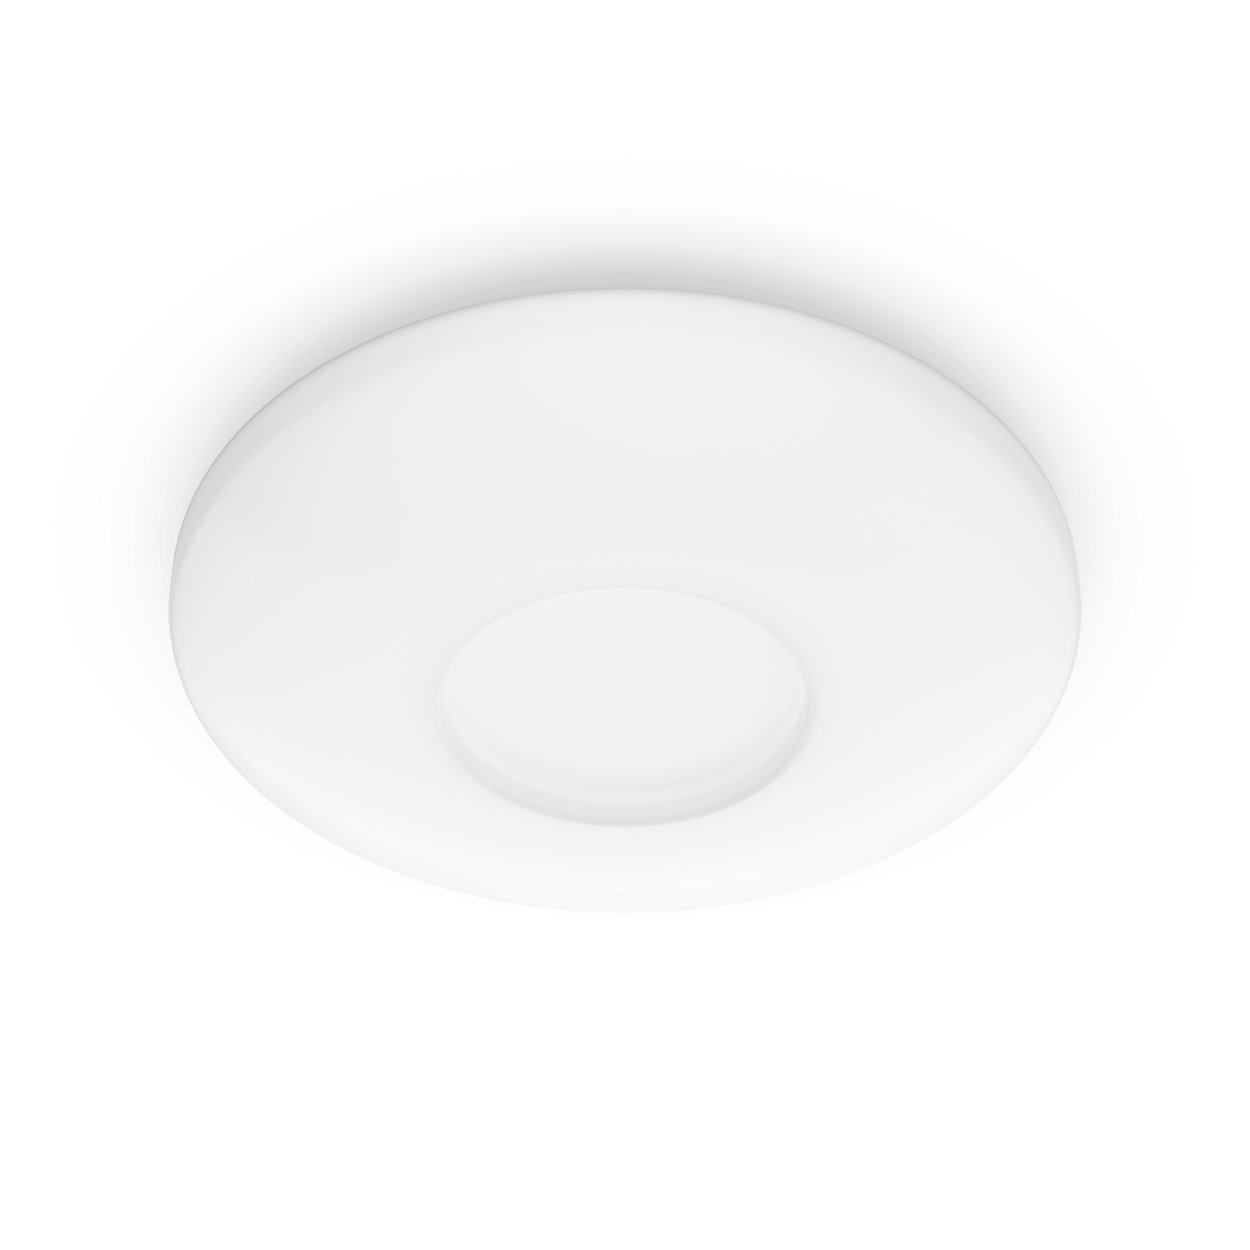 Iluminación LED confortable que no molestará tus ojos.